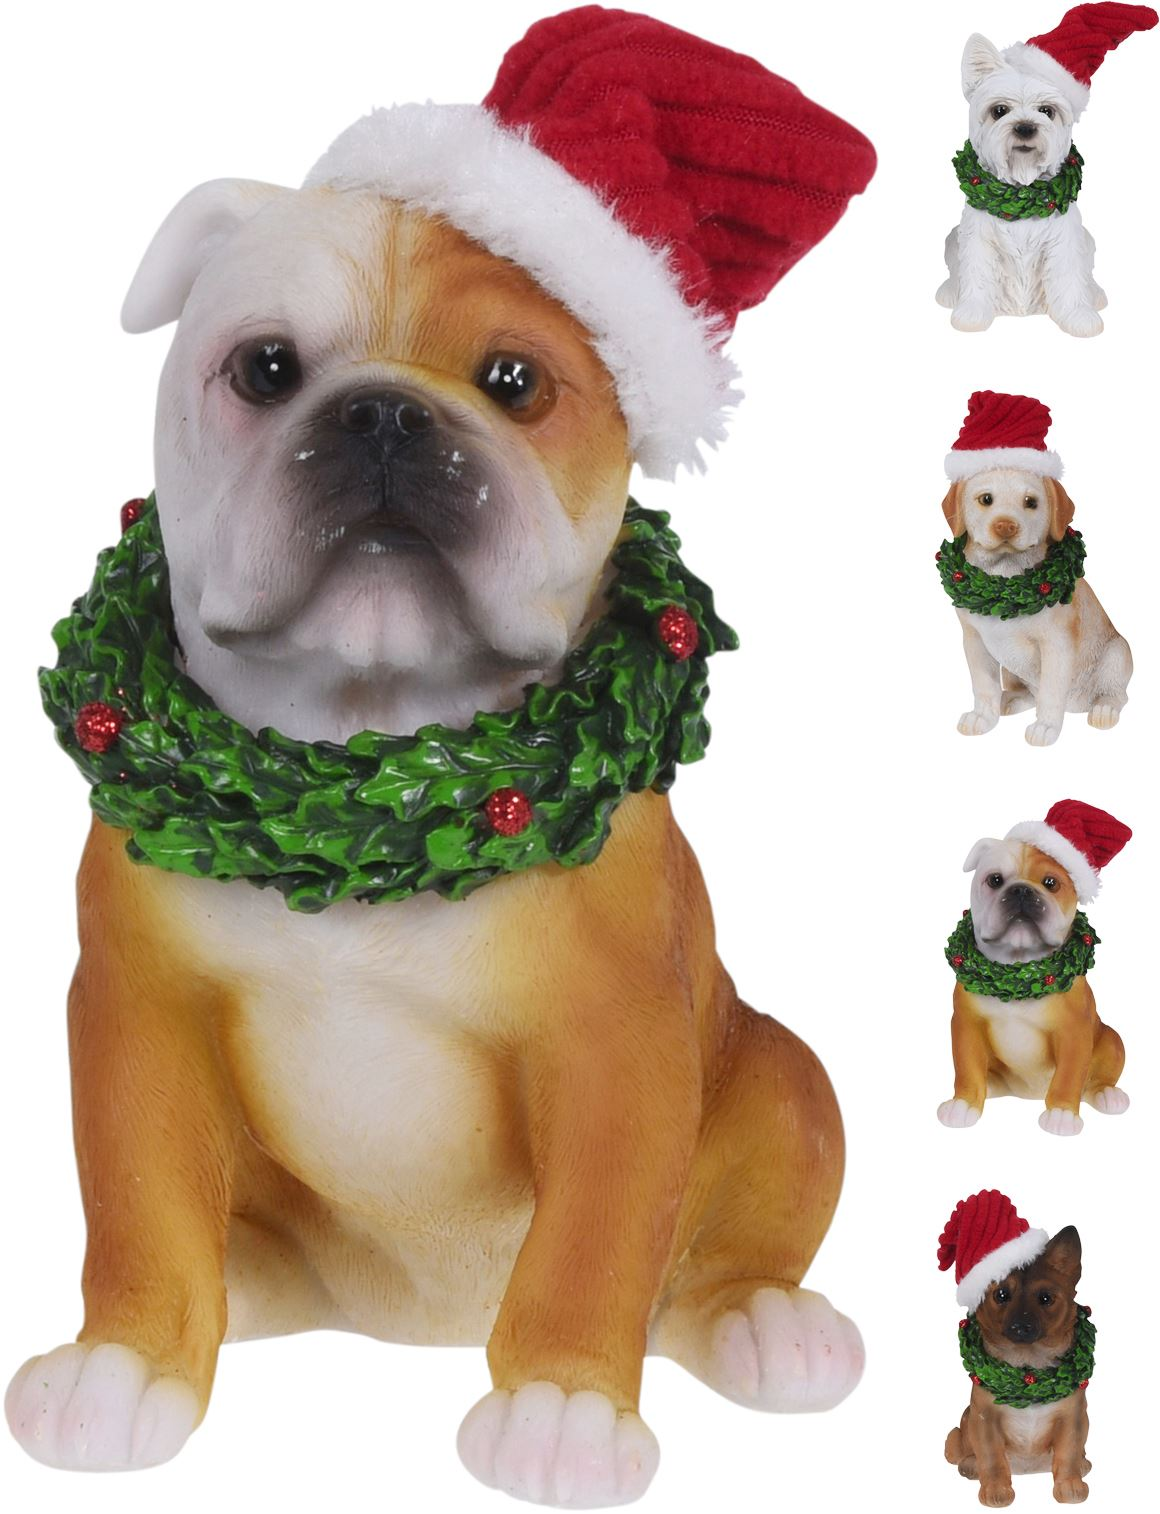 Christmas Dog Figurine Statue Ornament Xmas Santa Animal Decoration Ebay